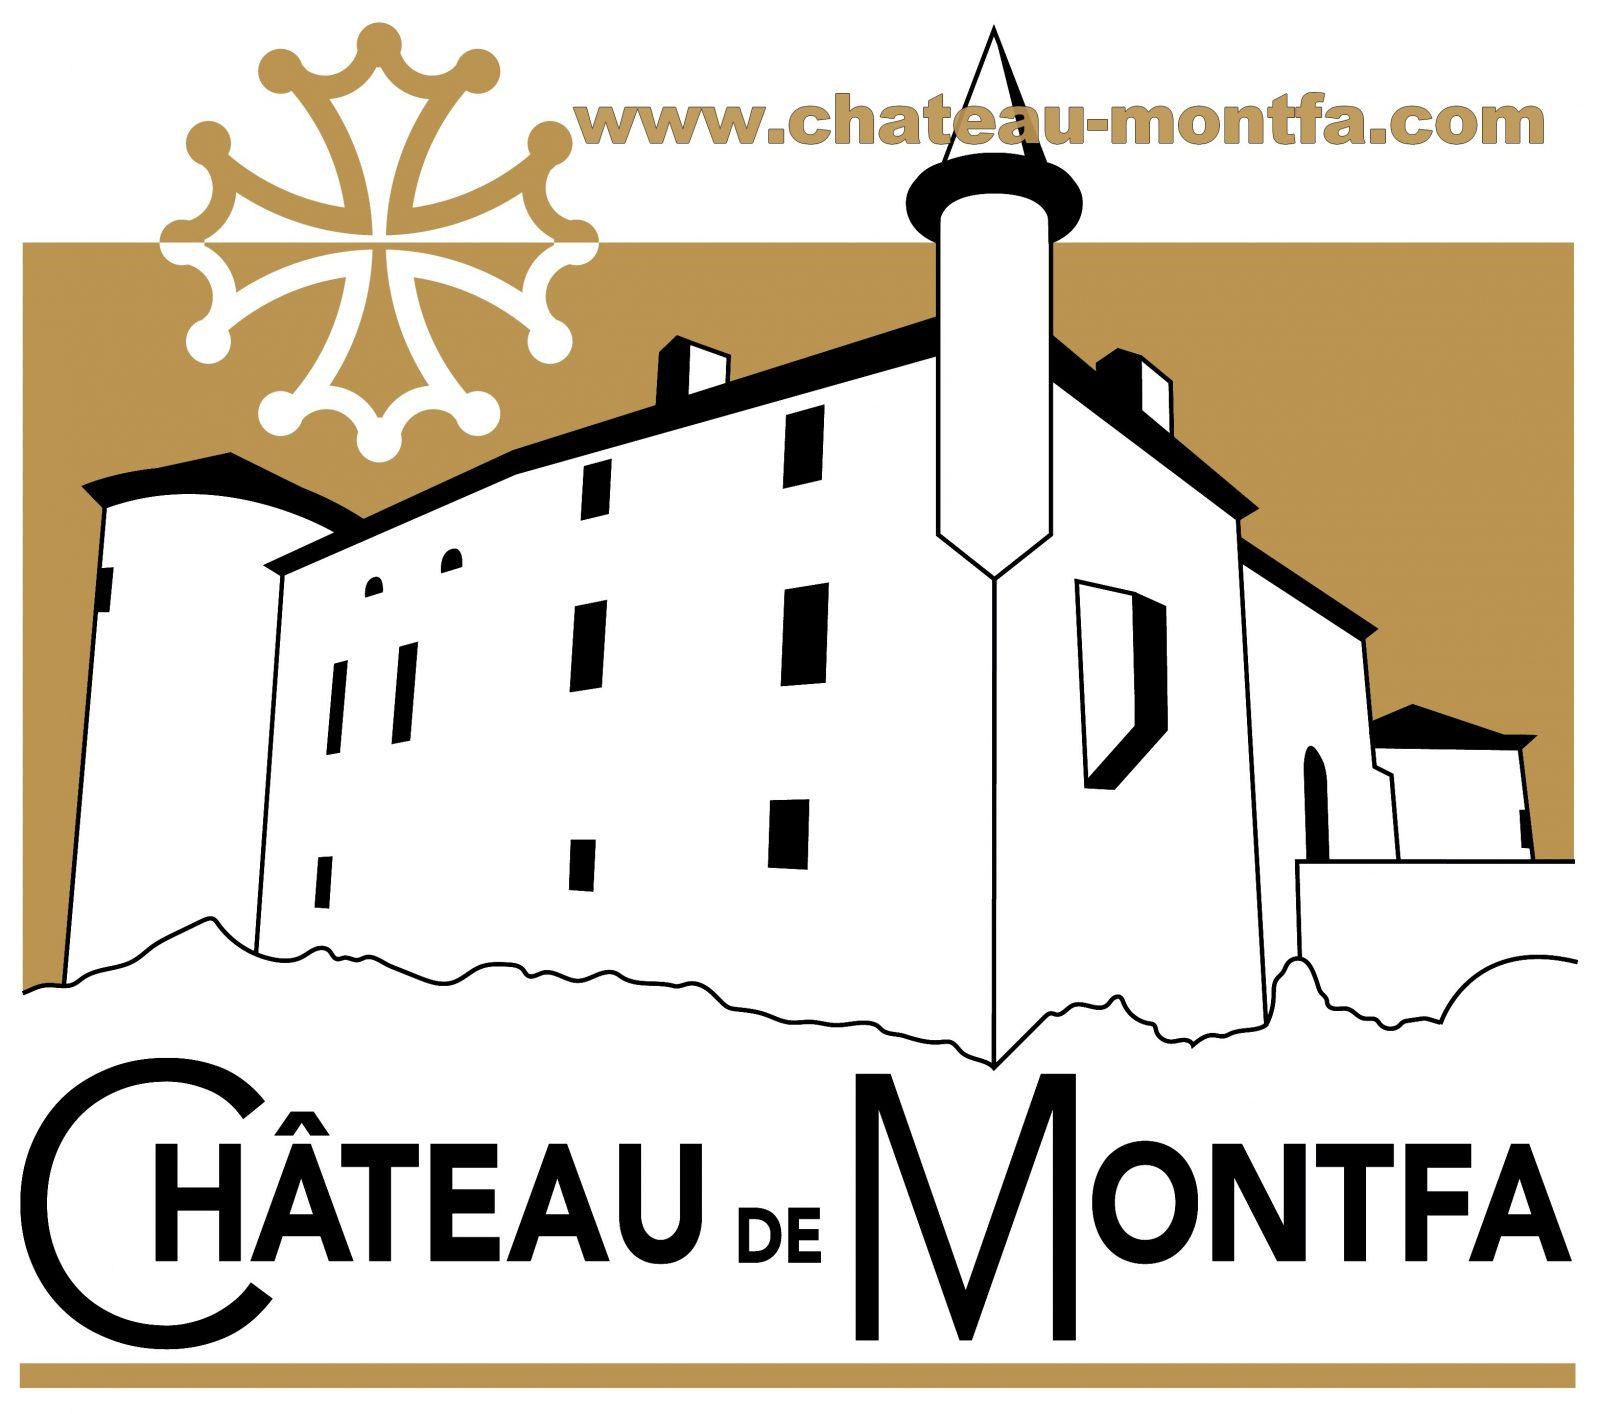 Logo Château de Montfa